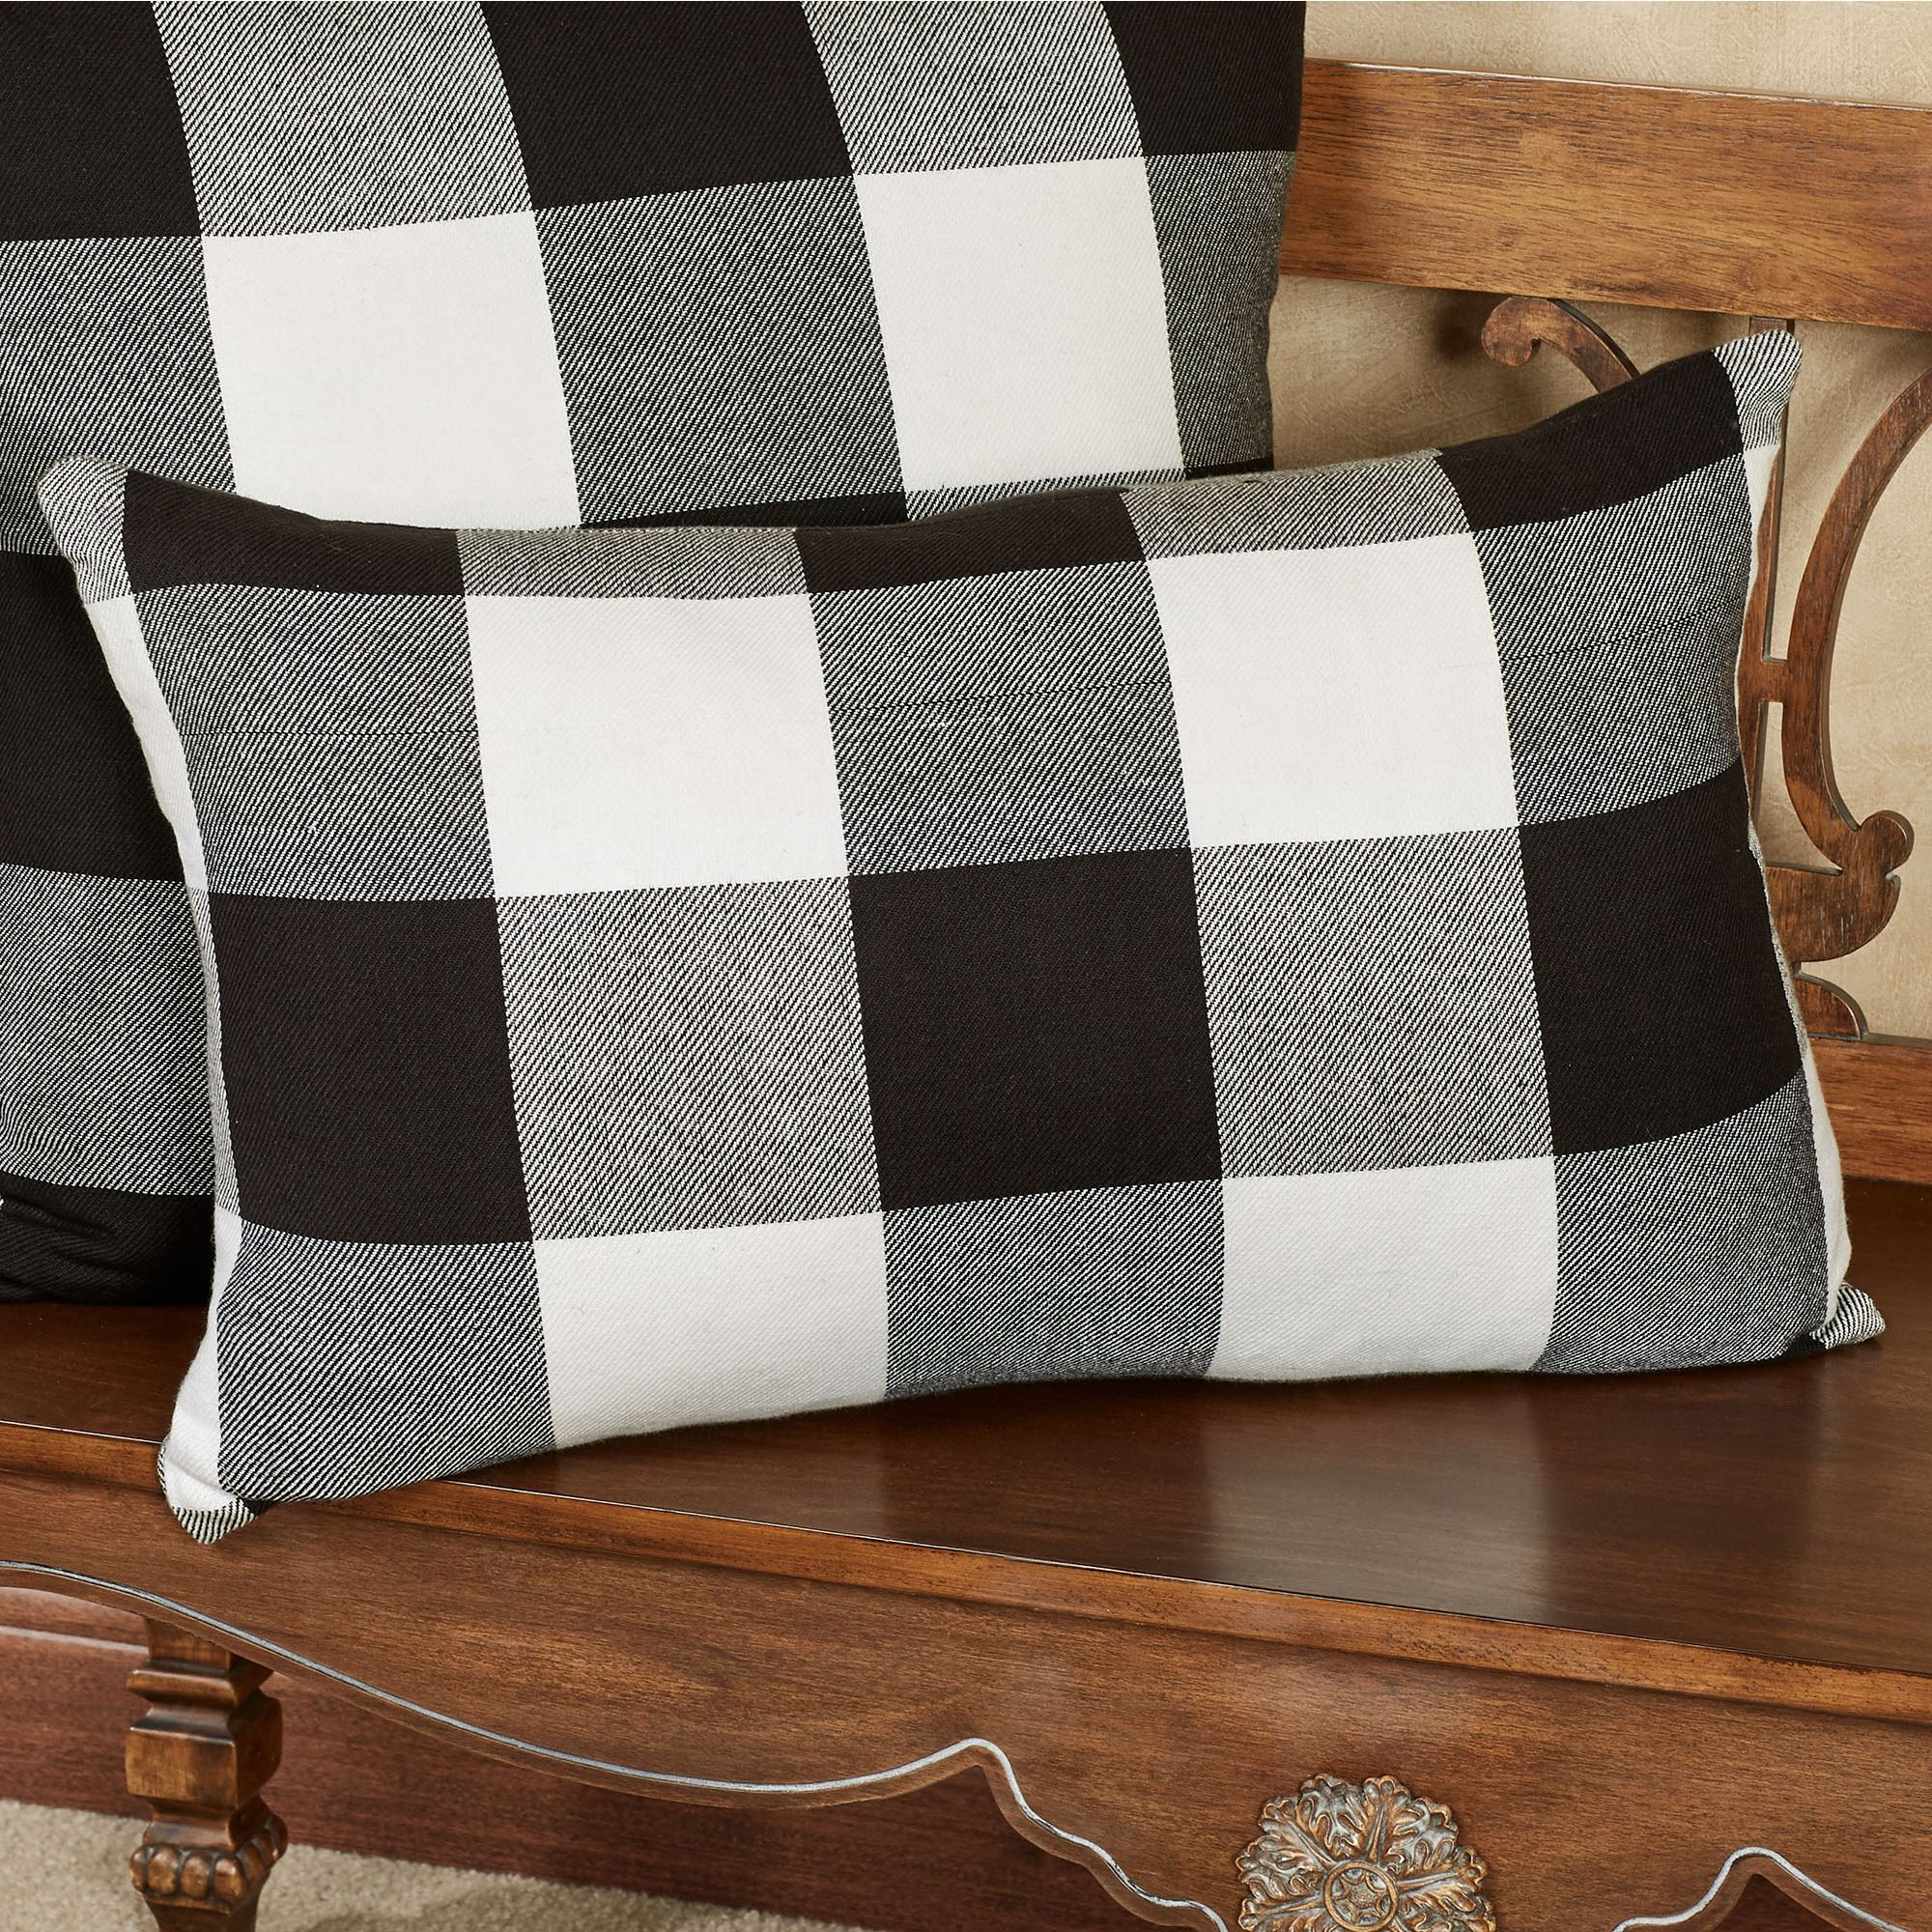 Rustic Buffalo Plaid Black And White Pillows